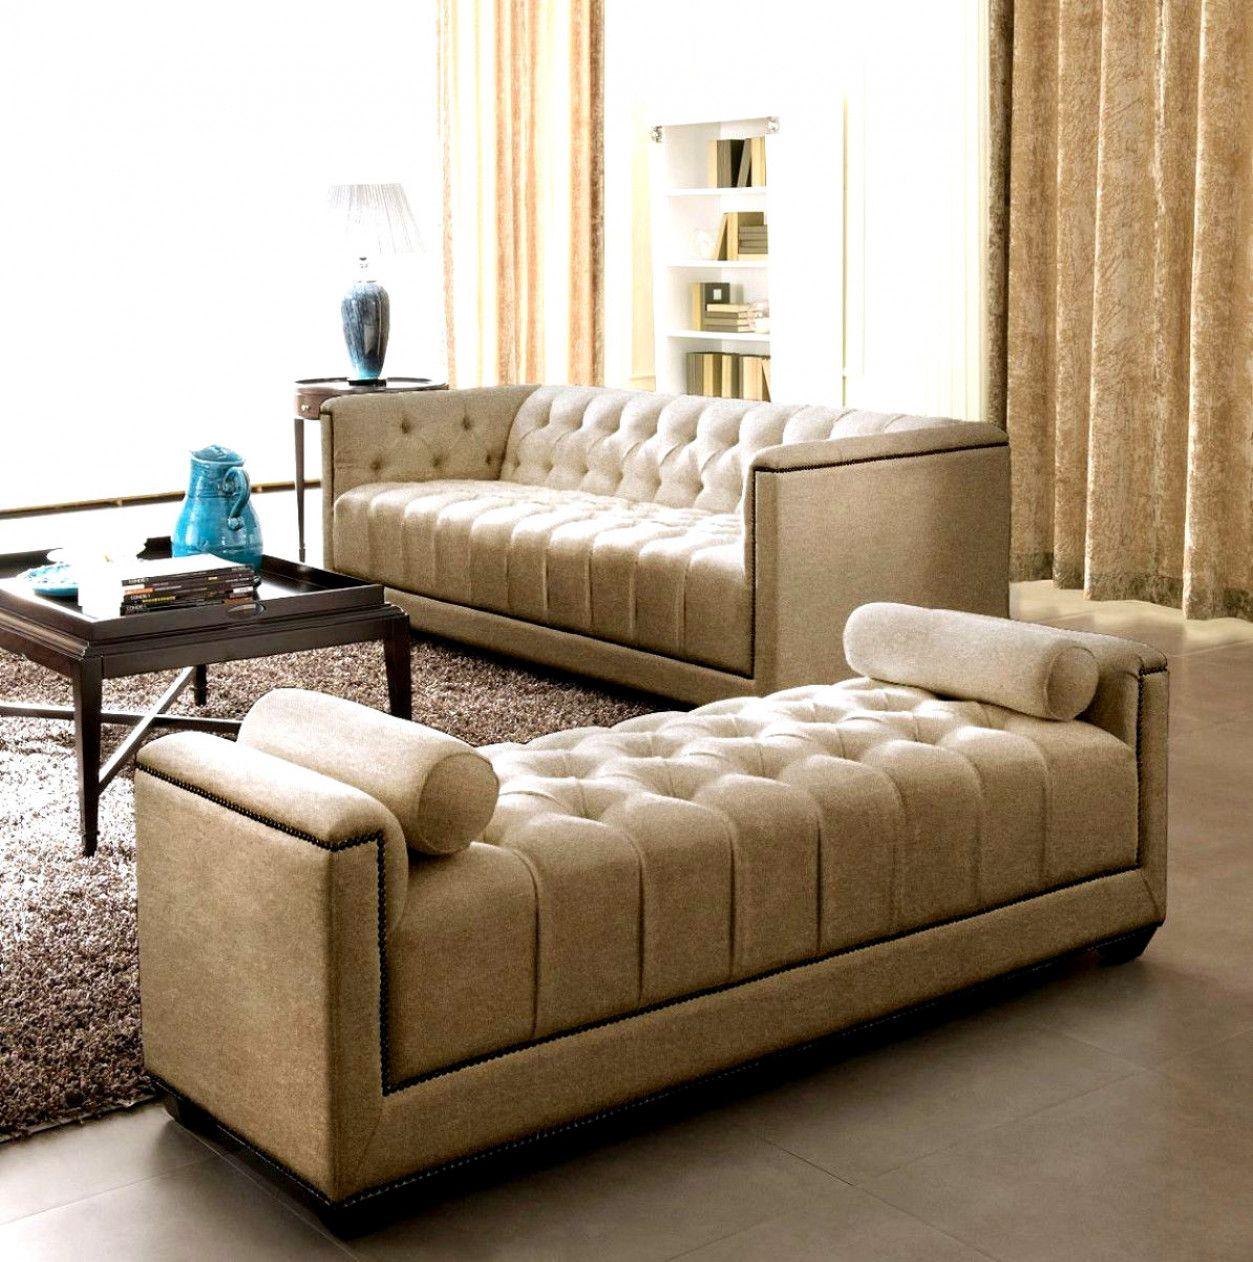 Room Store Living Room Furniture: Fabric Sofa Set - Eden - Gold In 2019